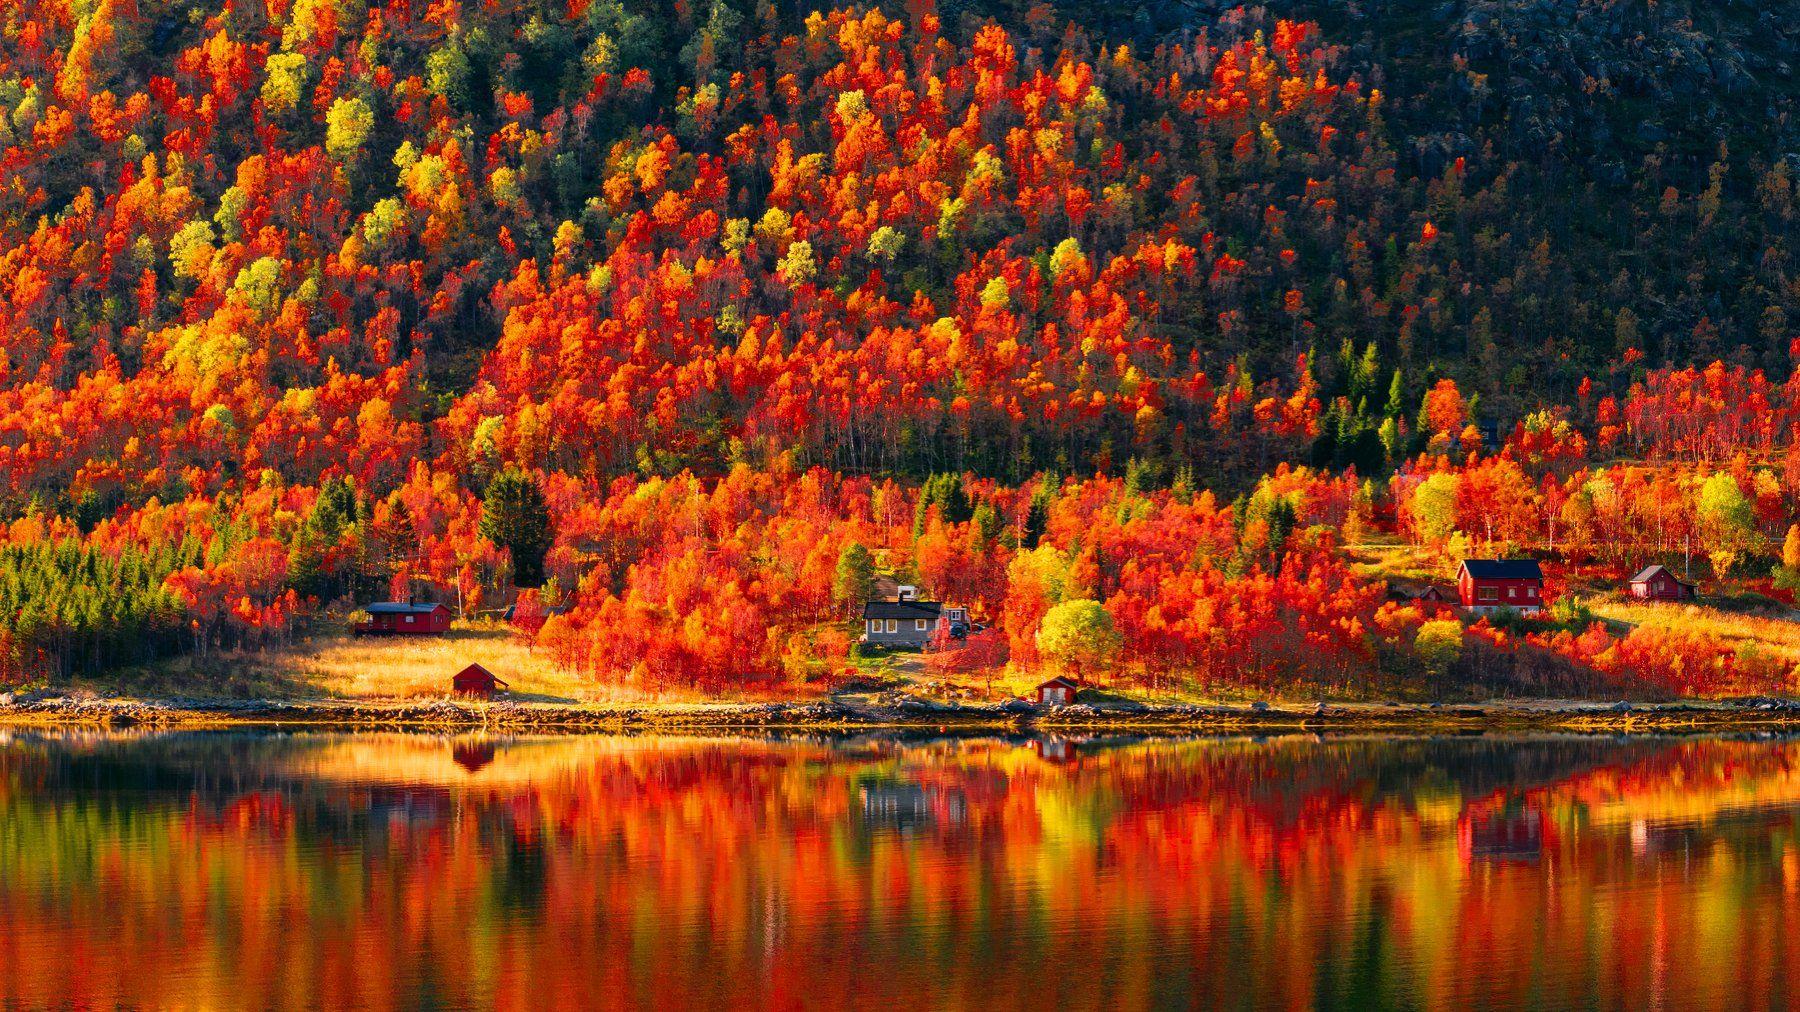 природа,осень,гора,лес,вода,отражение, Пётр Перепеченко